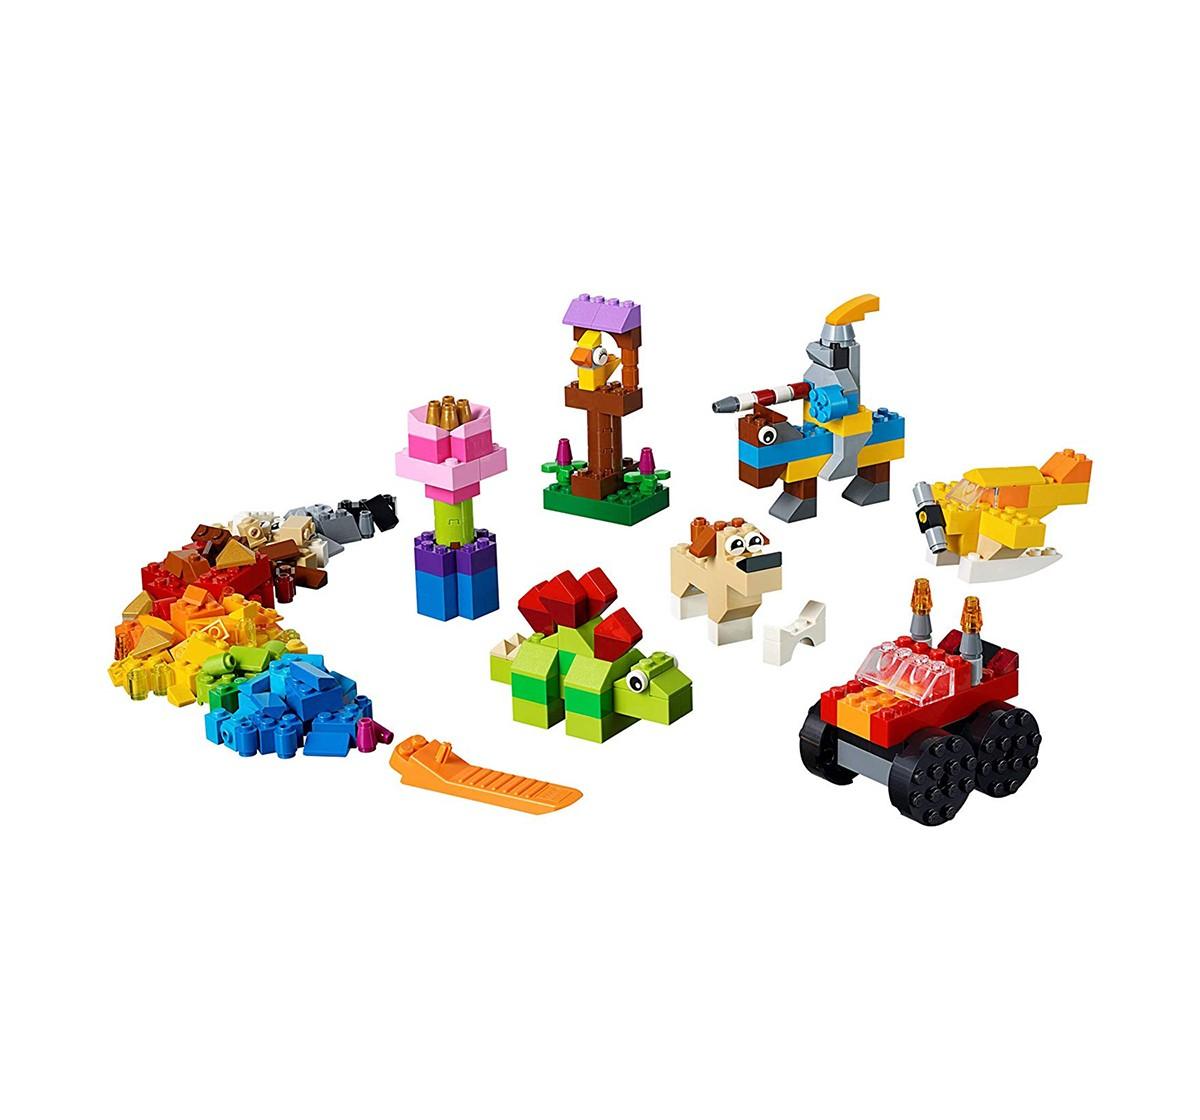 Lego Classic Basic Building Blocks (300 Pcs) 11002  for Kids age 4Y+